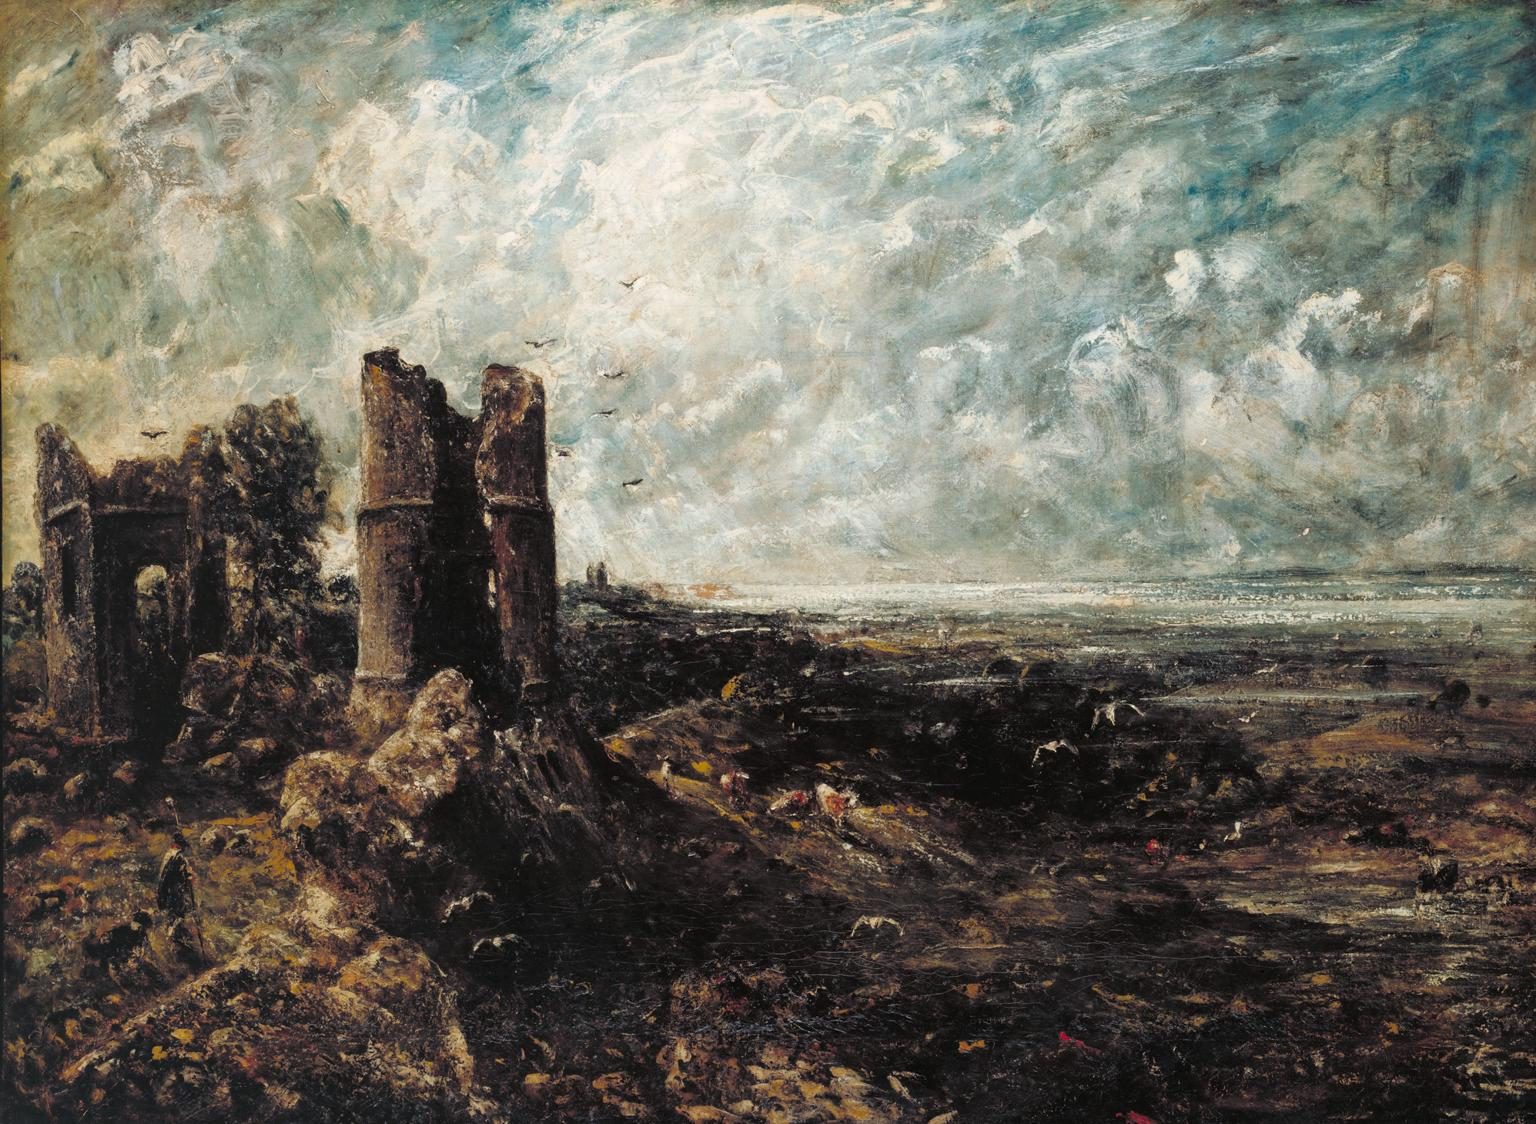 Sketch for 'Hadleigh Castle' c.1828-9 John Constable 1776-1837 Purchased 1935 http://www.tate.org.uk/art/work/N04810